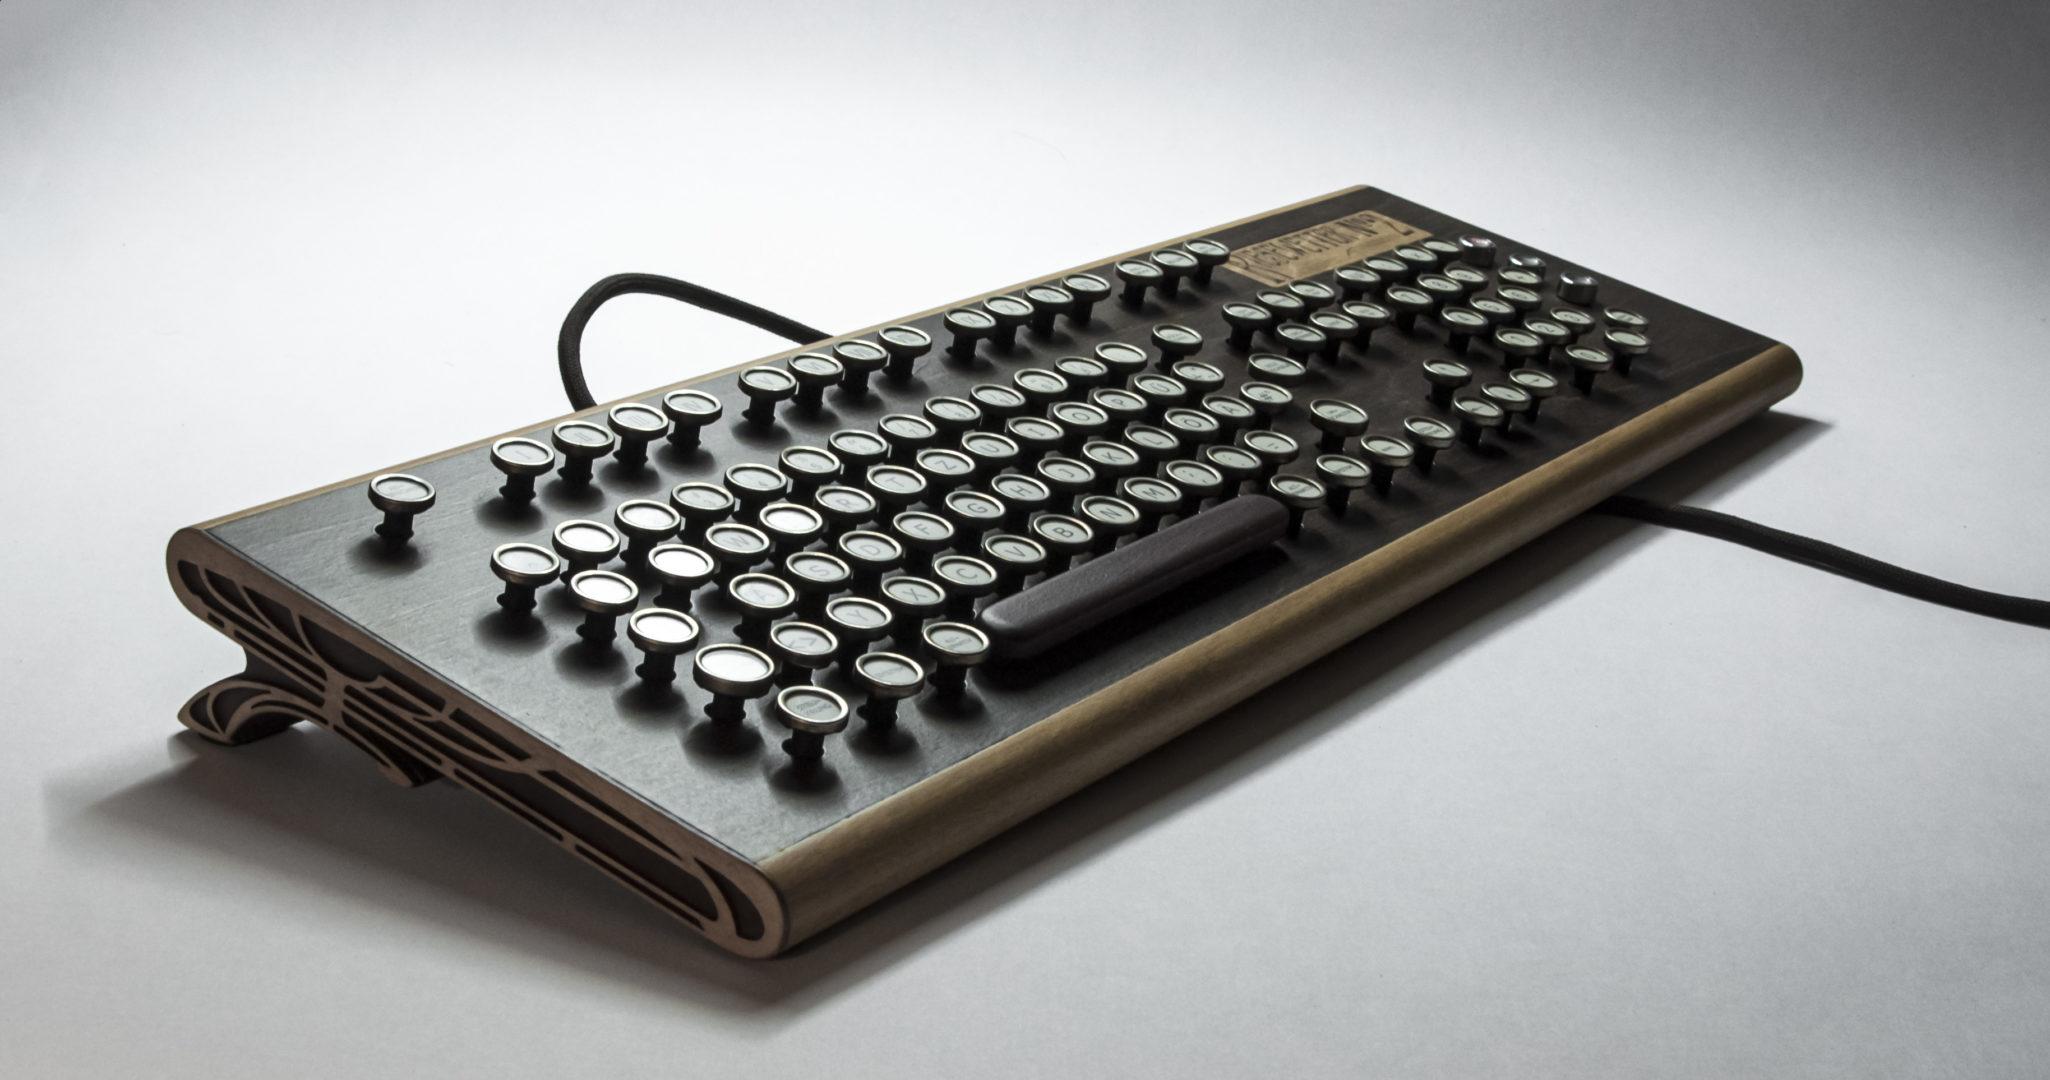 steampunk_keyboard_no2 produktphoto (101b)